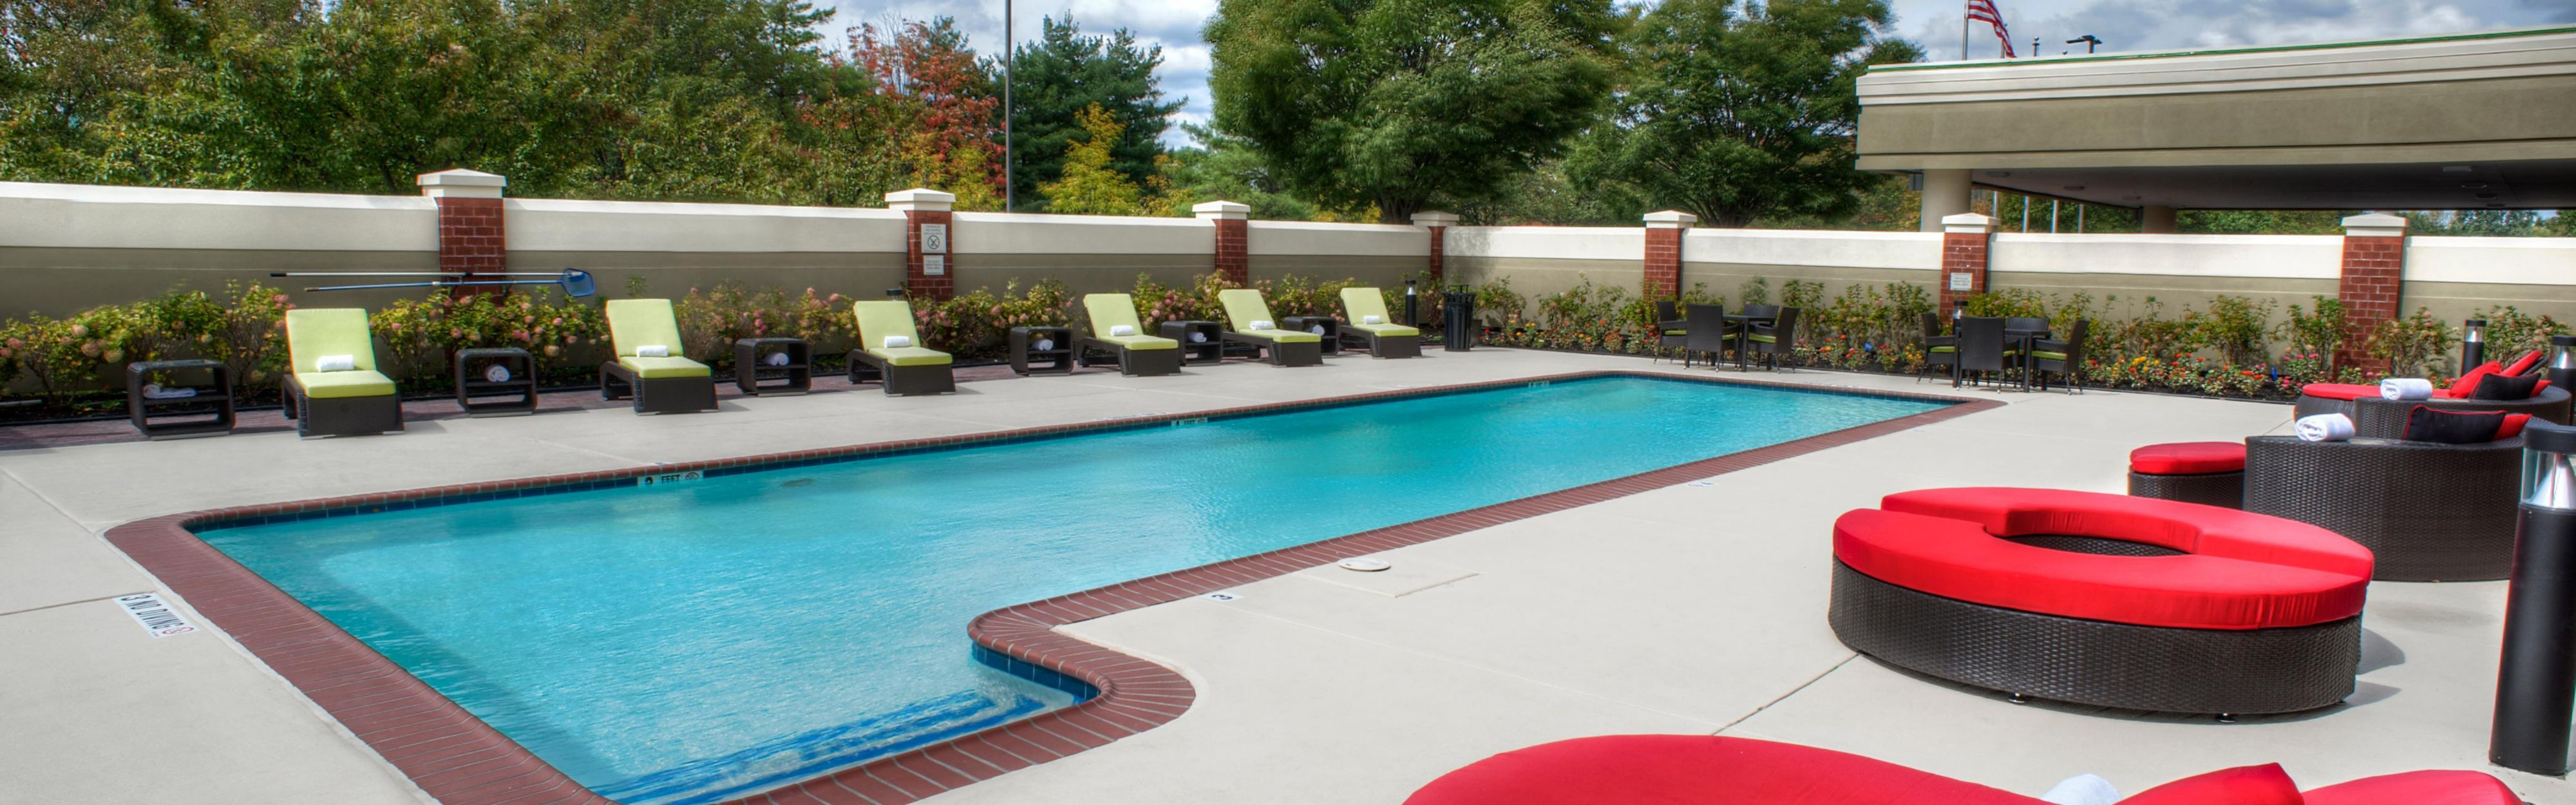 Holiday Inn Bensalem-Philadelphia Area image 2